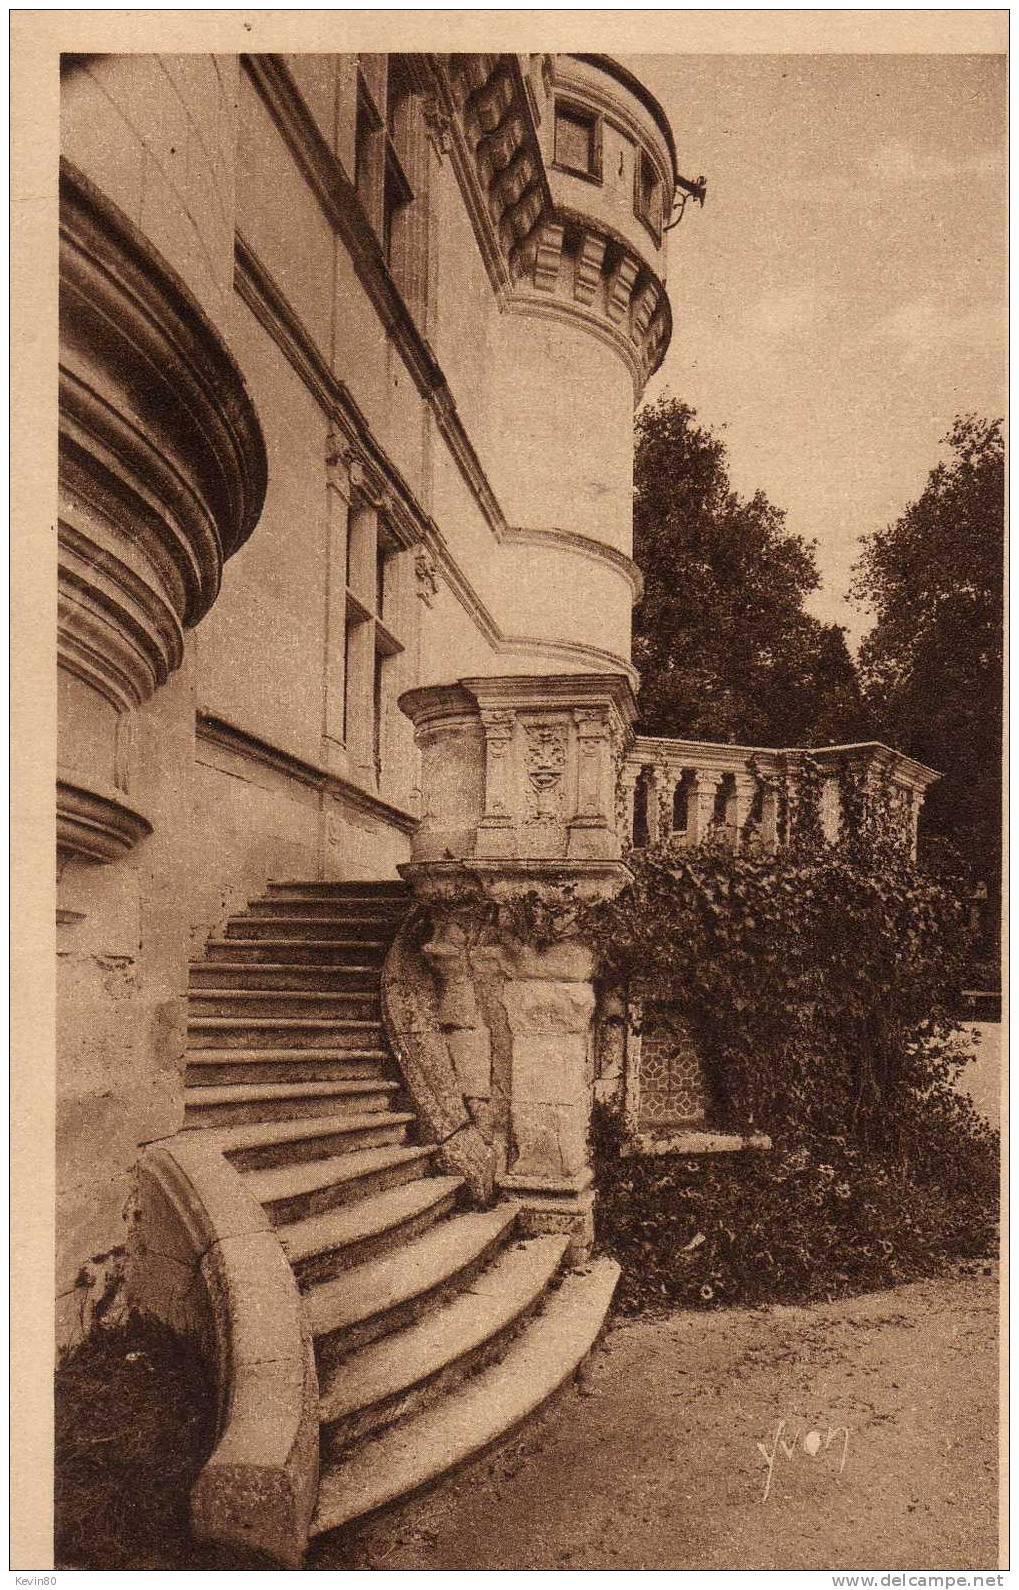 37 AZAY LE RIDEAU Façade De L'Escalier - Azay-le-Rideau